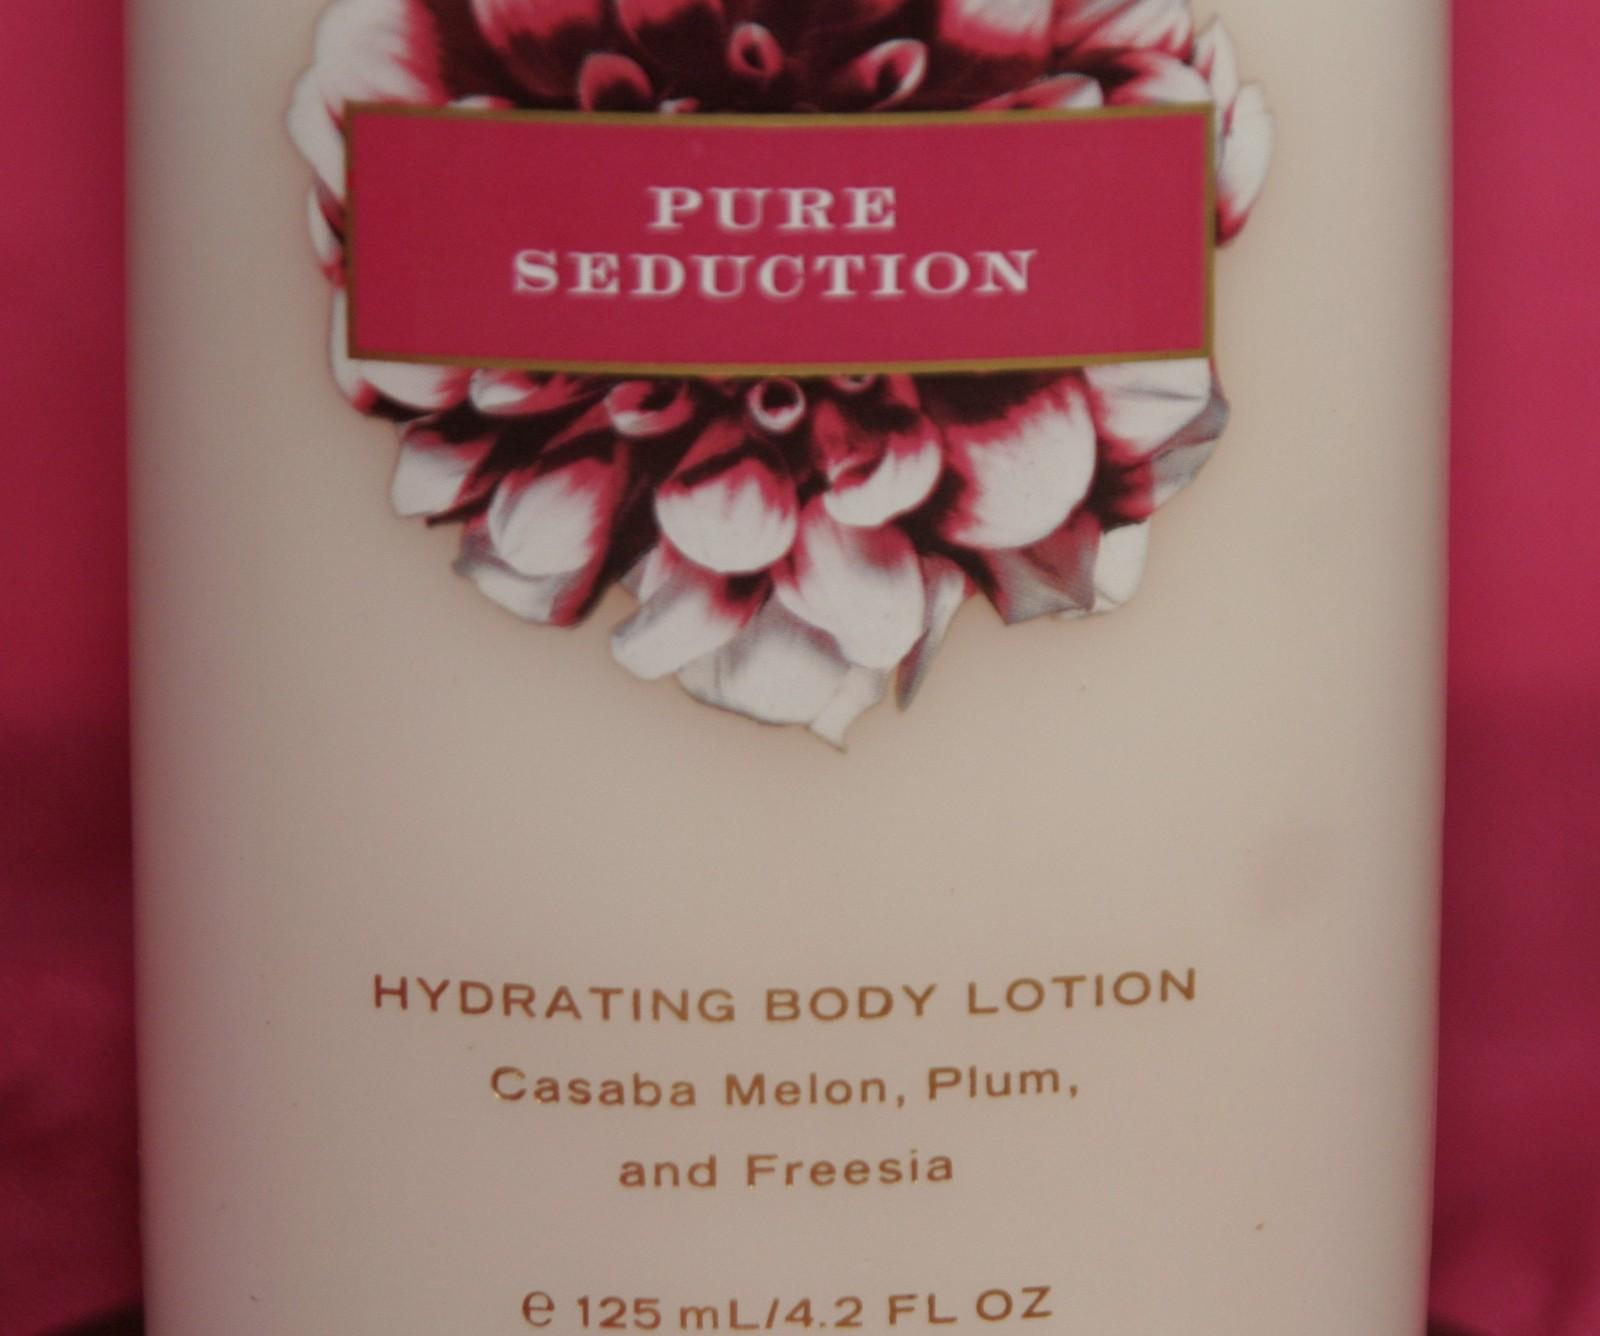 Victoria Secret Pure Seduction Hydrating Body Lotion 4.2 oz image 2